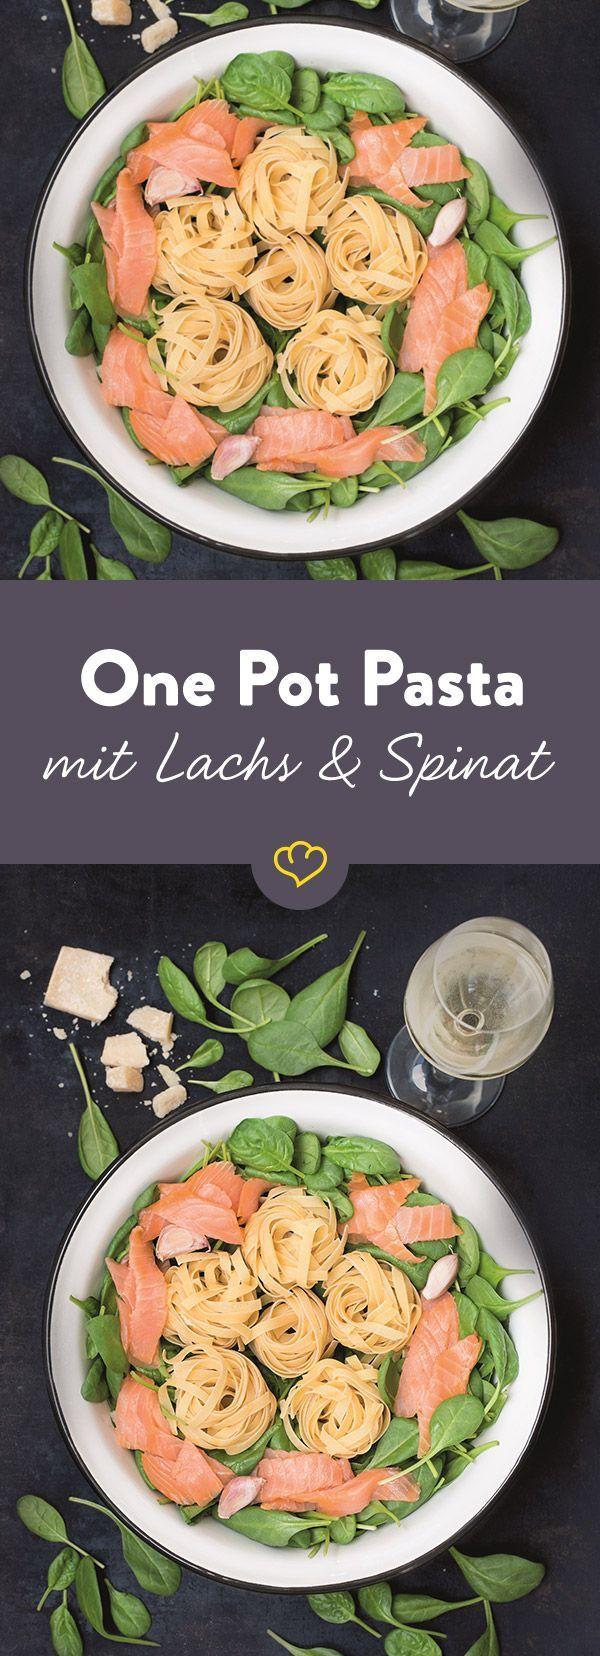 One Pot Pasta: Lachs & Spinat One Pot Pasta: Lachs & Spinat -  -